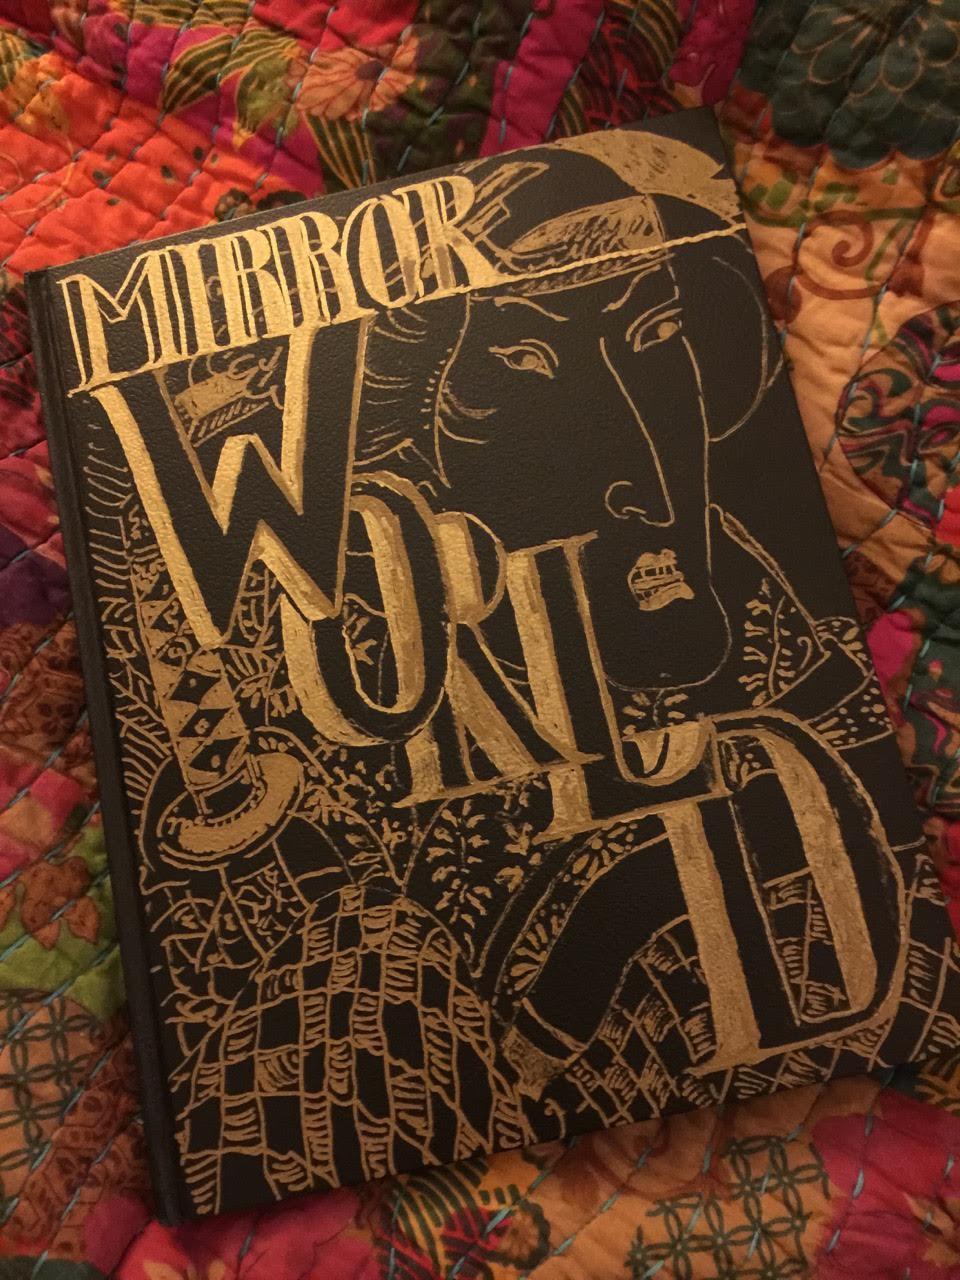 C notebook_mirrorworld cover.jpg